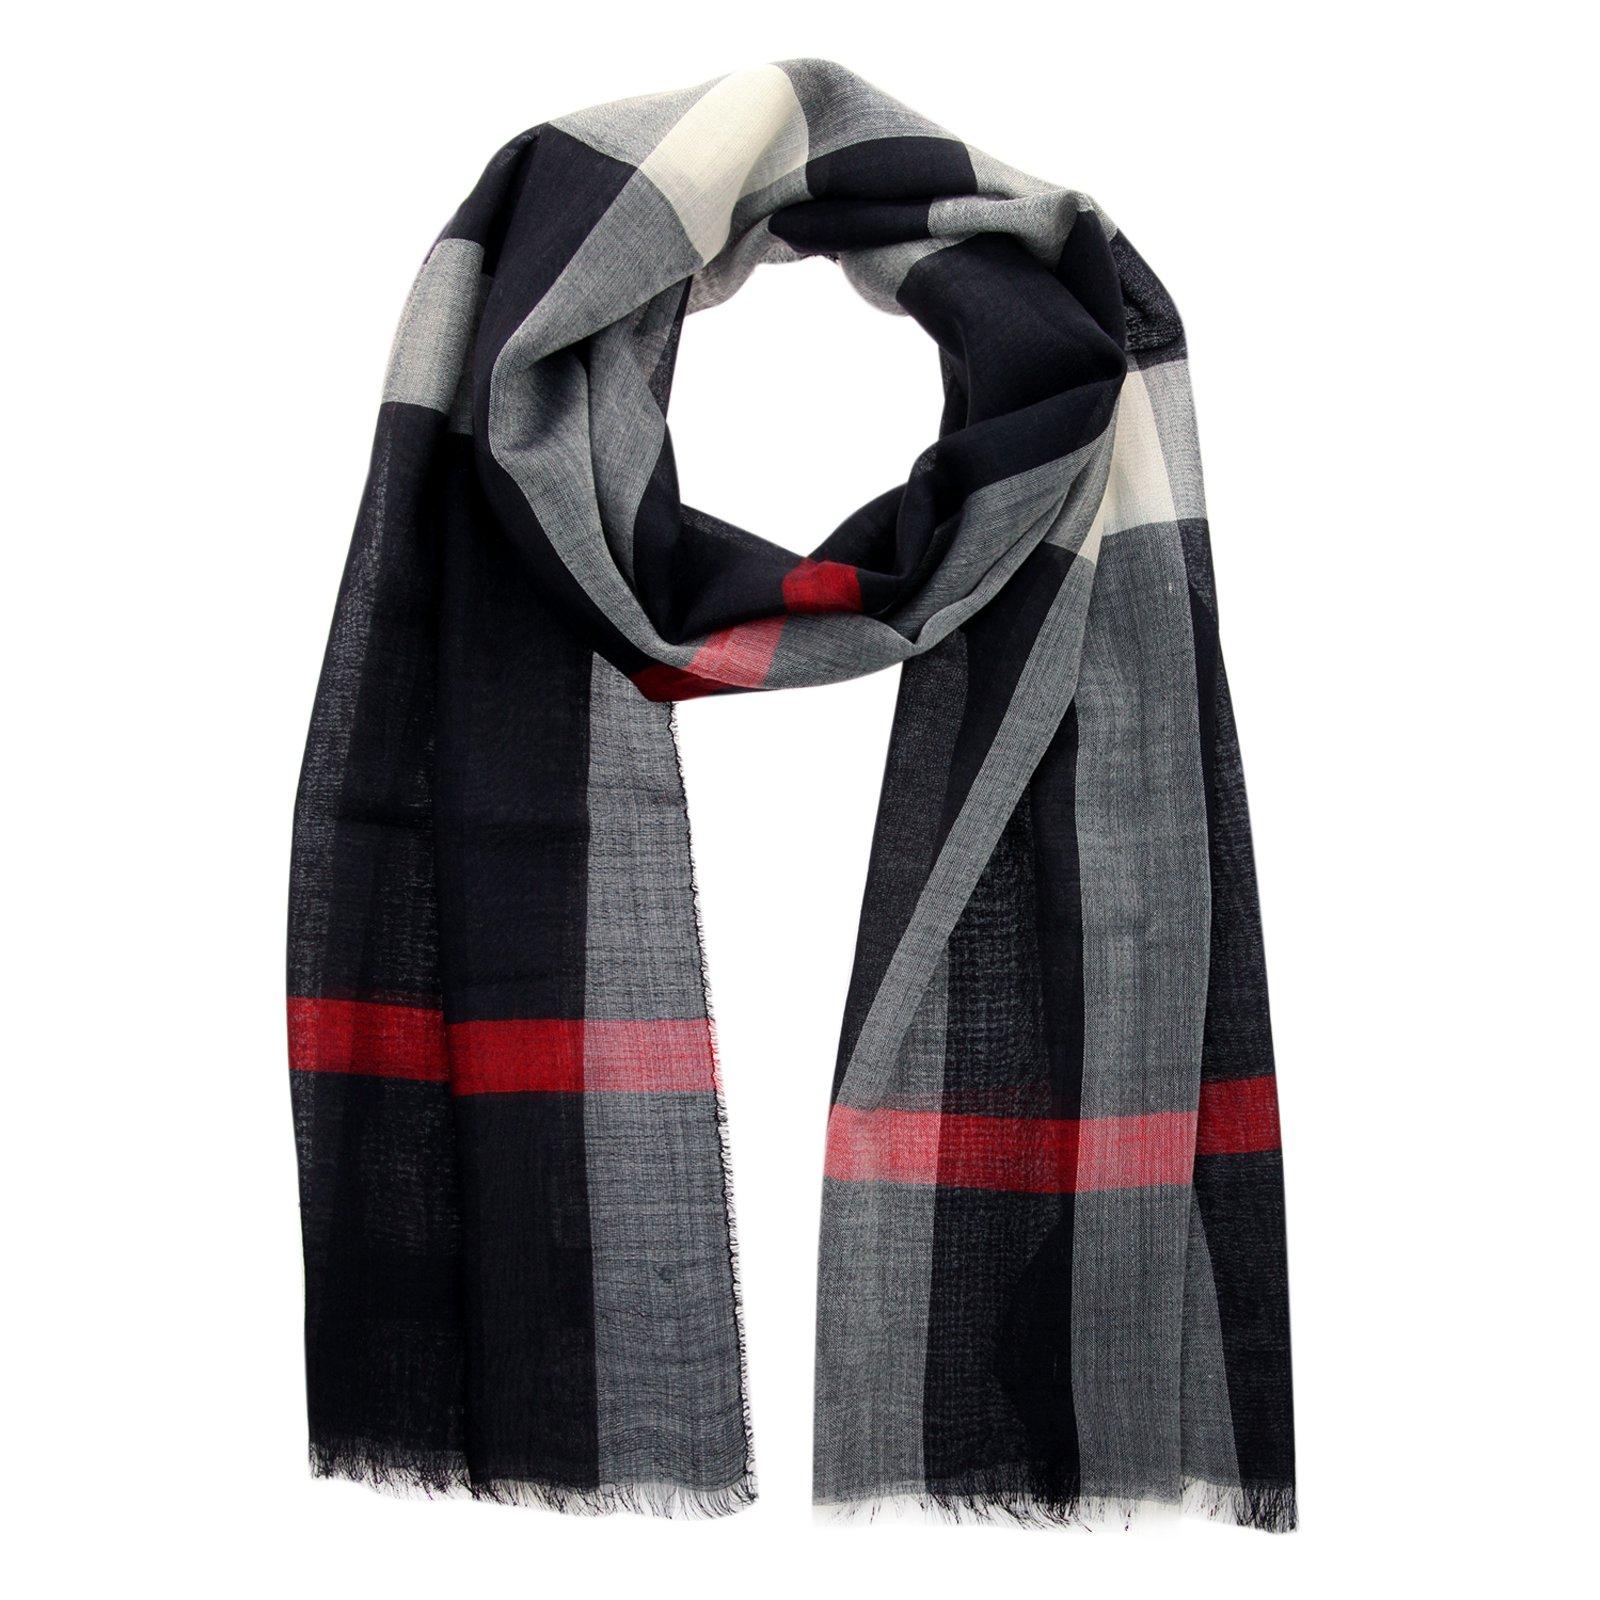 855a8a4a20a ... usa burberry scarf men scarves wool navy blue ref.71385 4e476 83e31